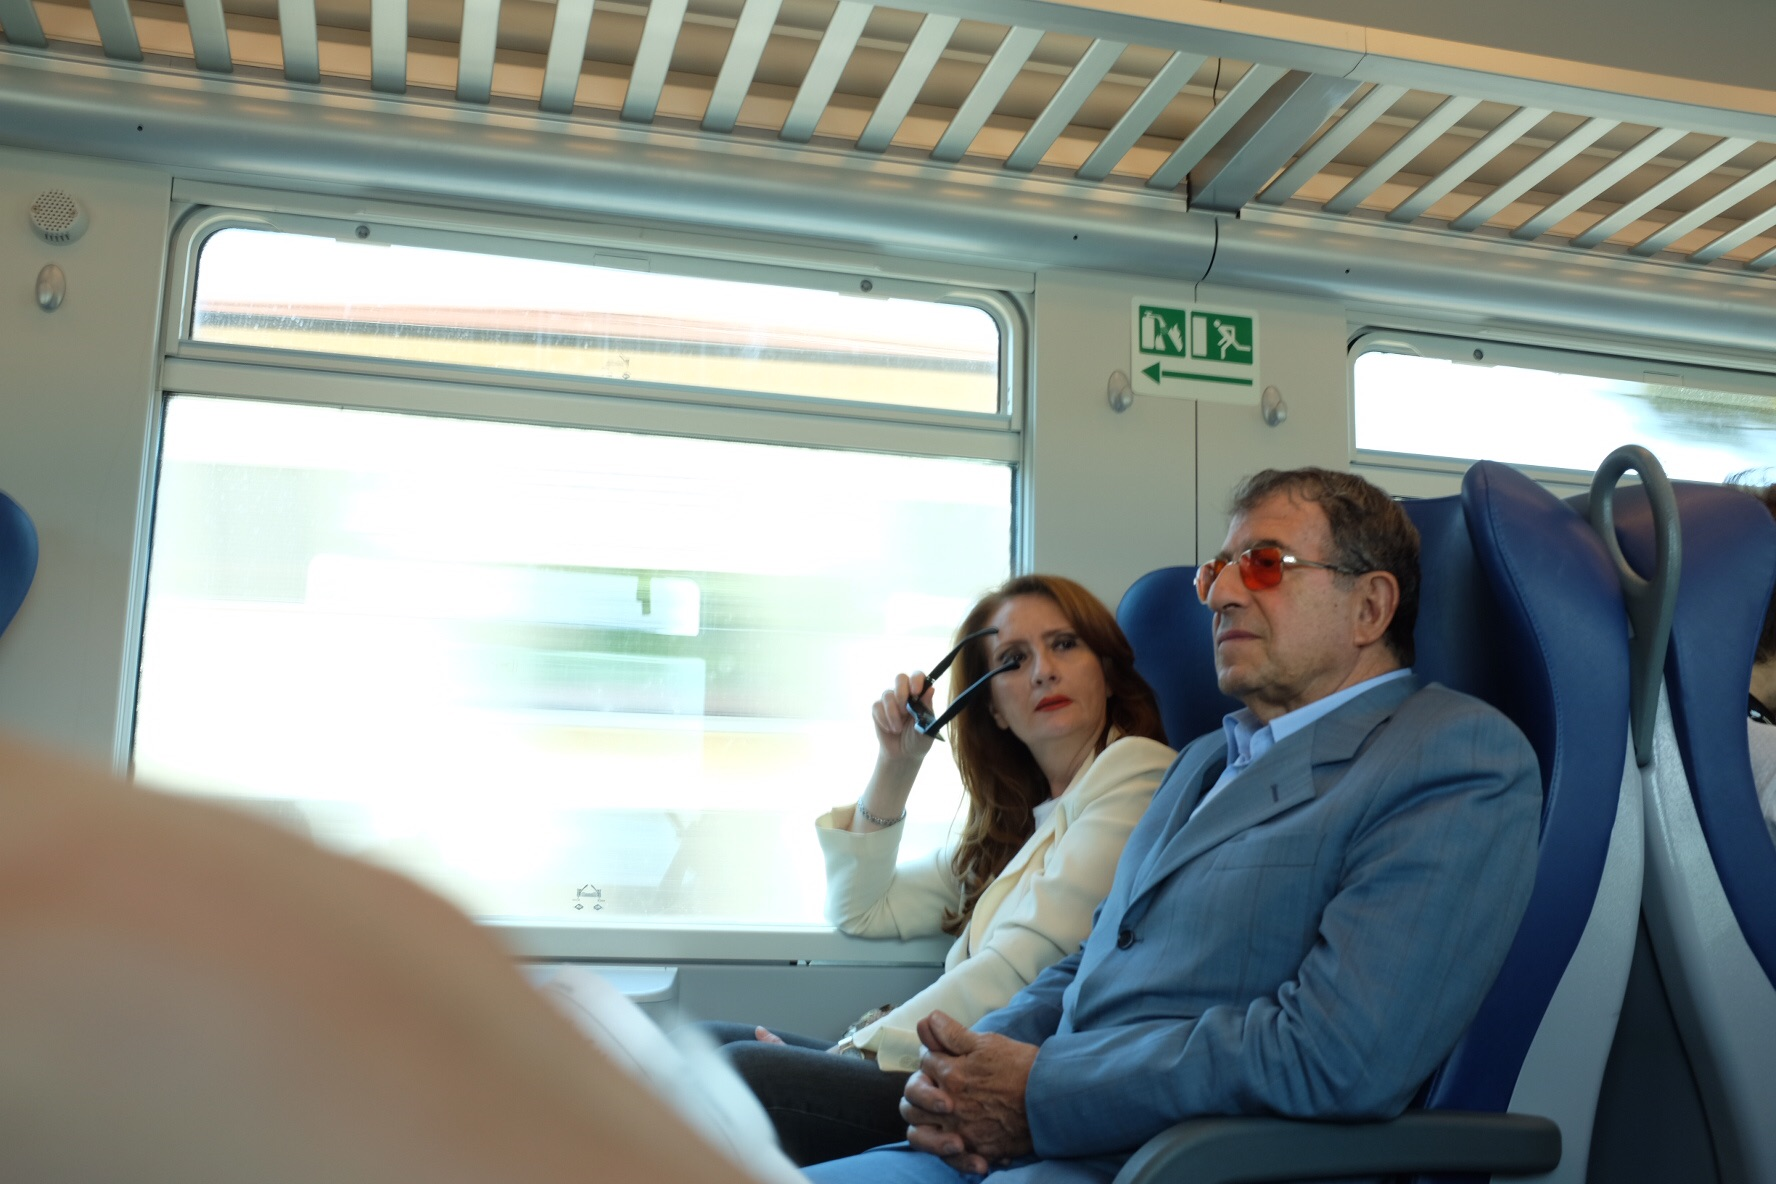 Tony Bennett sighting on the train to Pisa